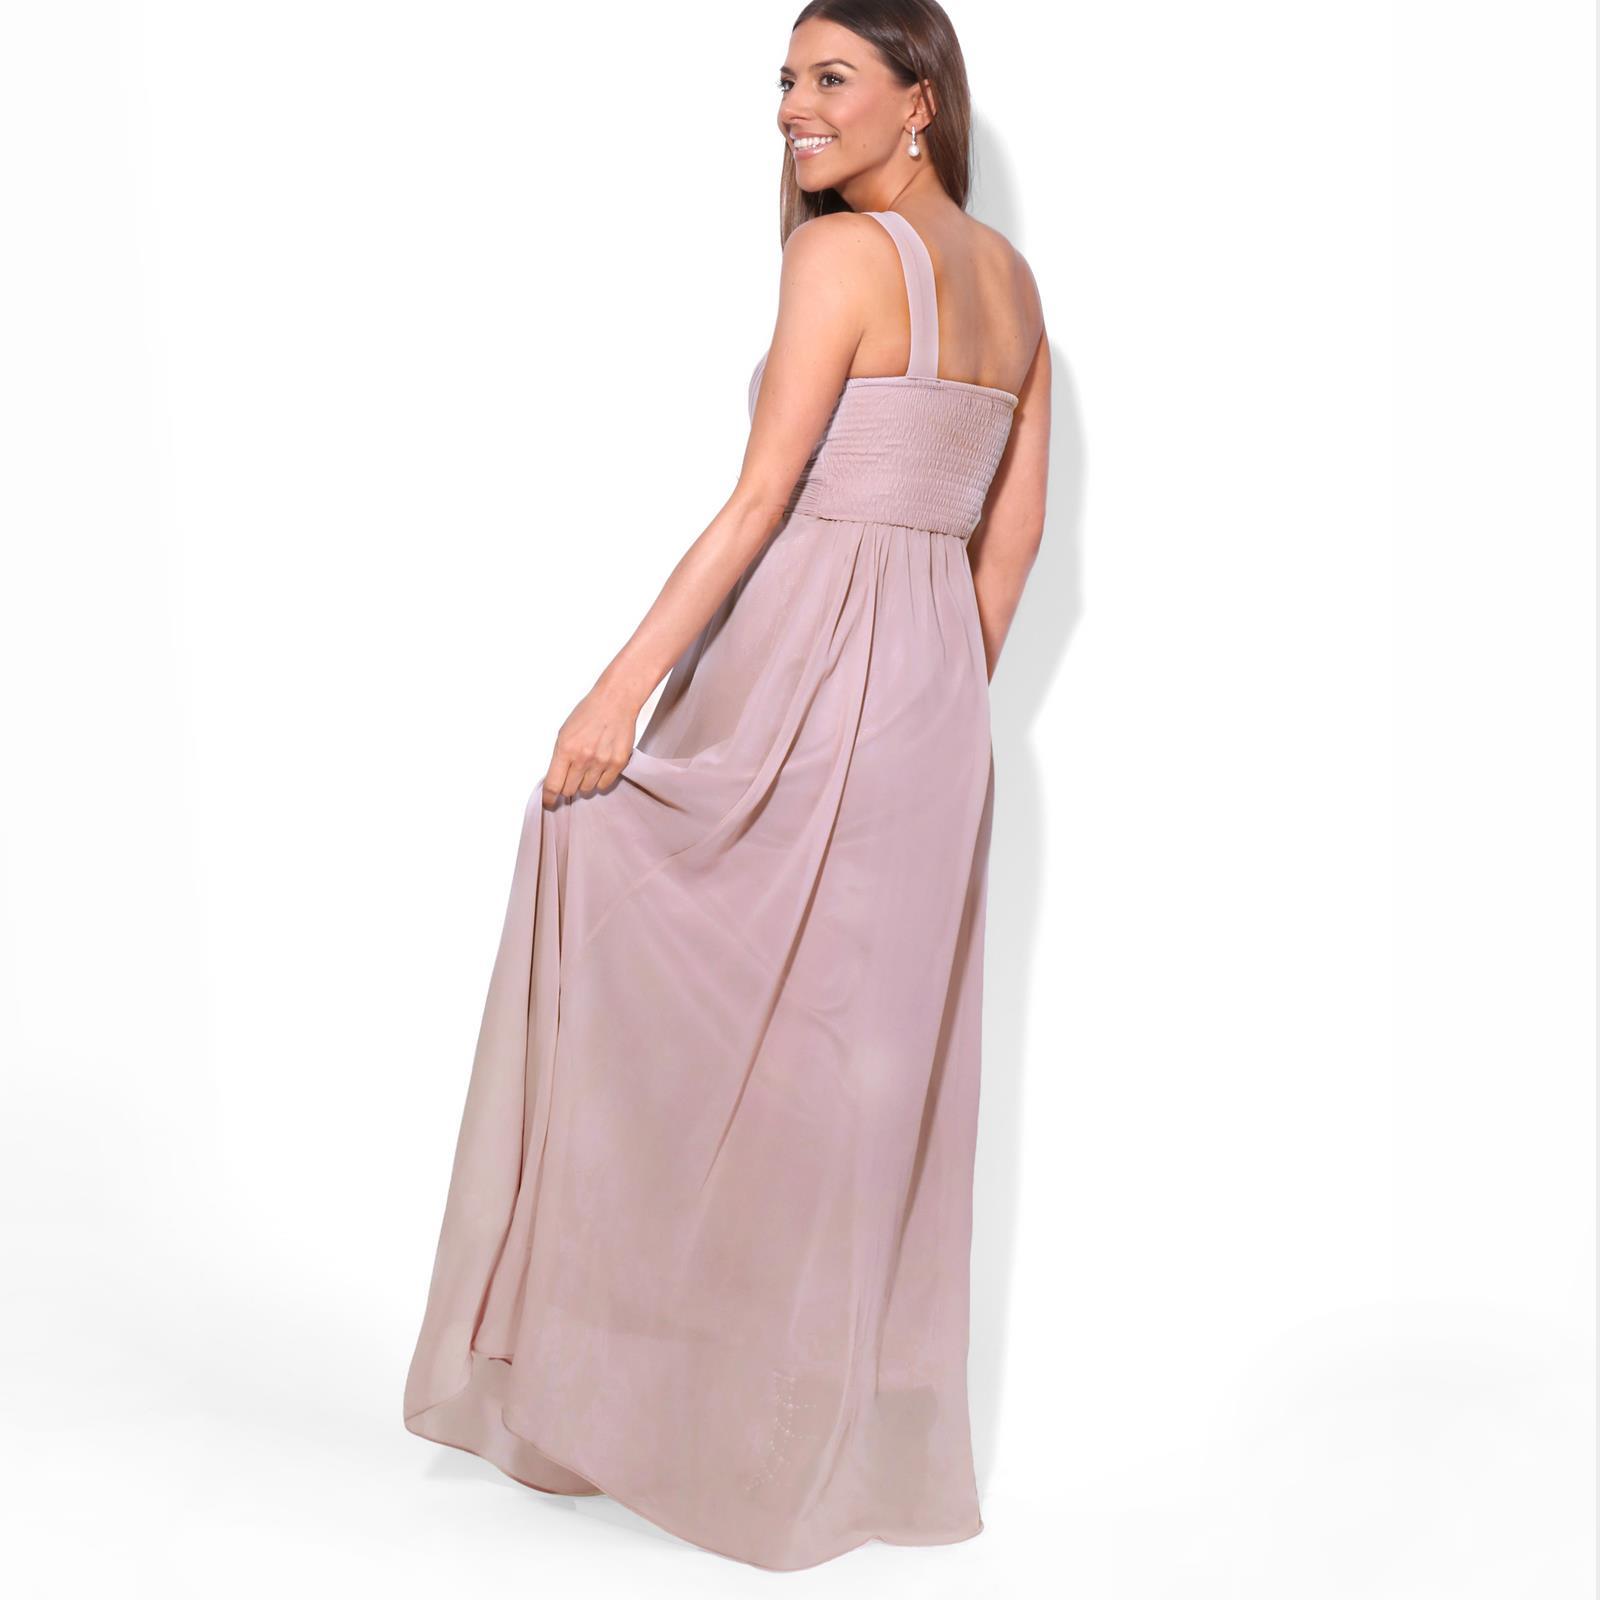 Womens-Wedding-Bridesmaid-Prom-Dress-Formal-One-Off-Shoulder-Long-Evening-8-18 thumbnail 69